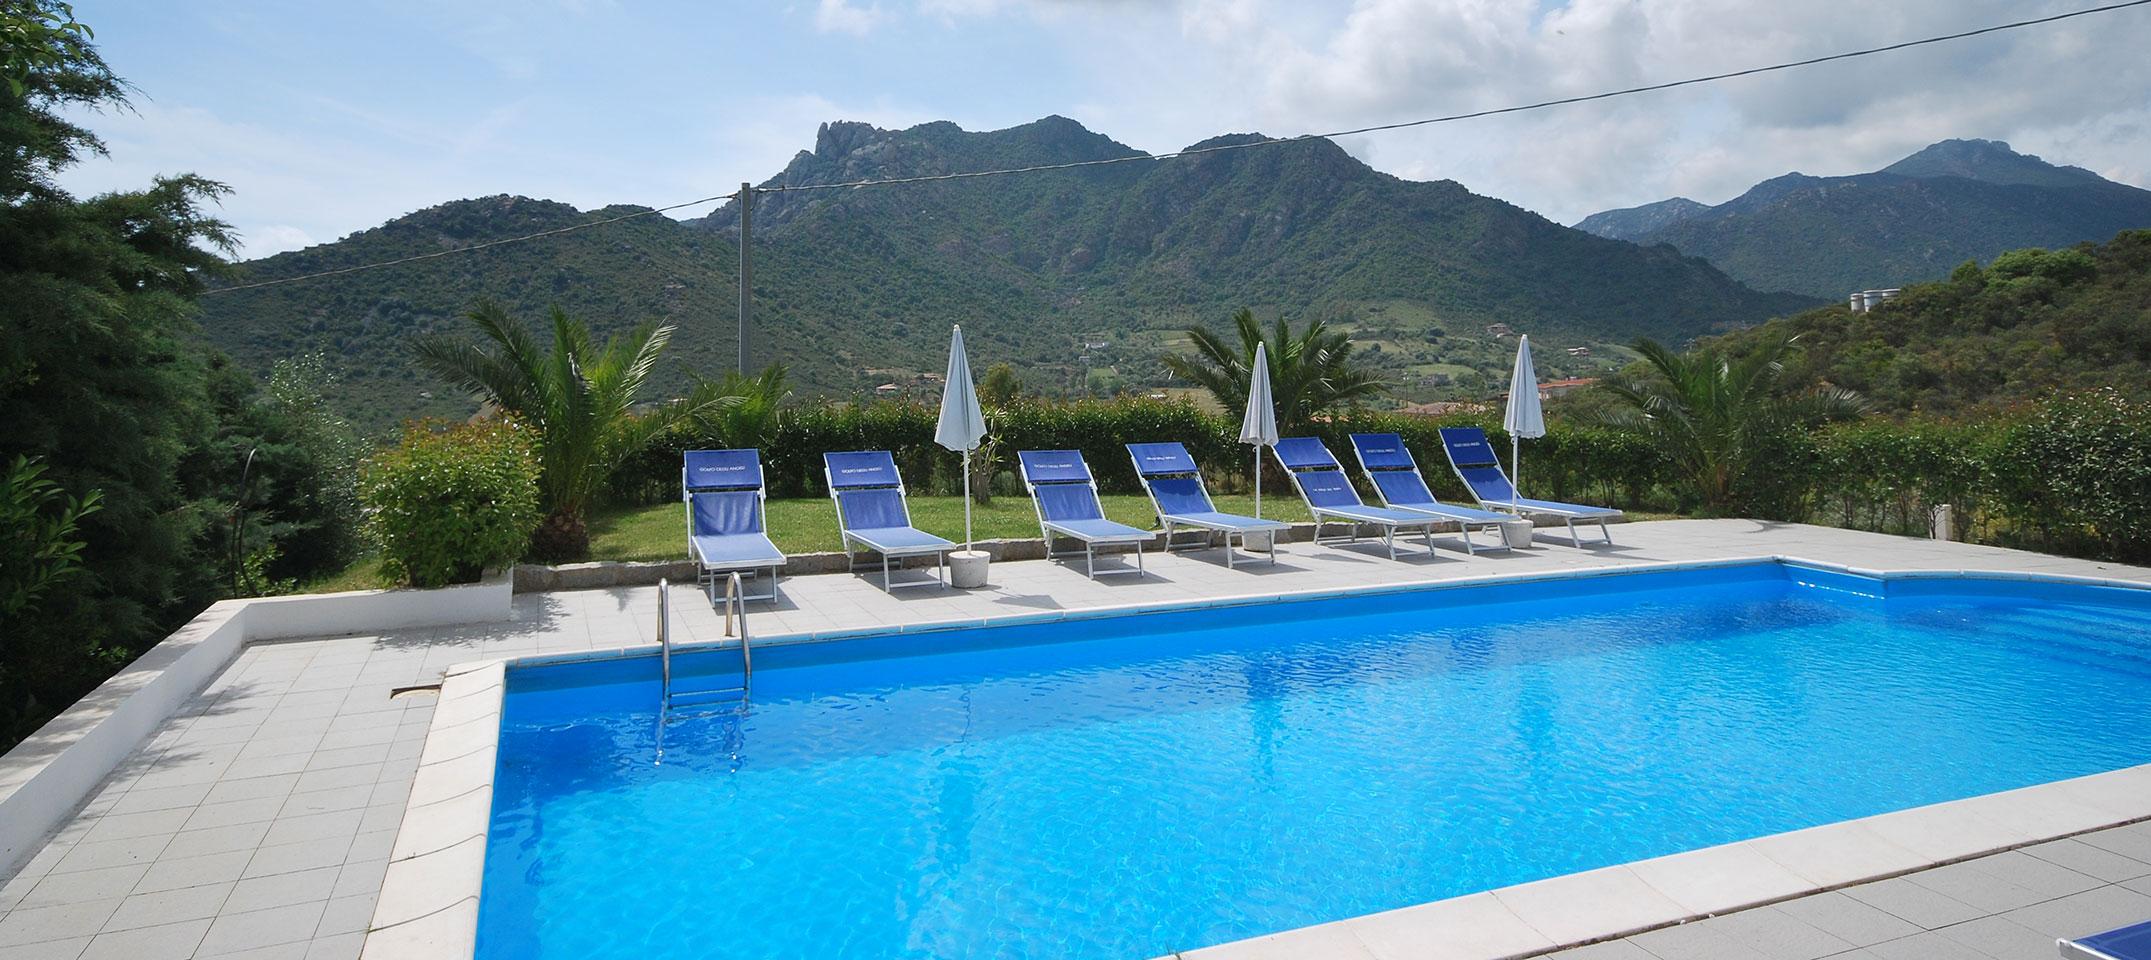 Hotel resort tanca cardedu sardaigne italie for Hotels sardaigne